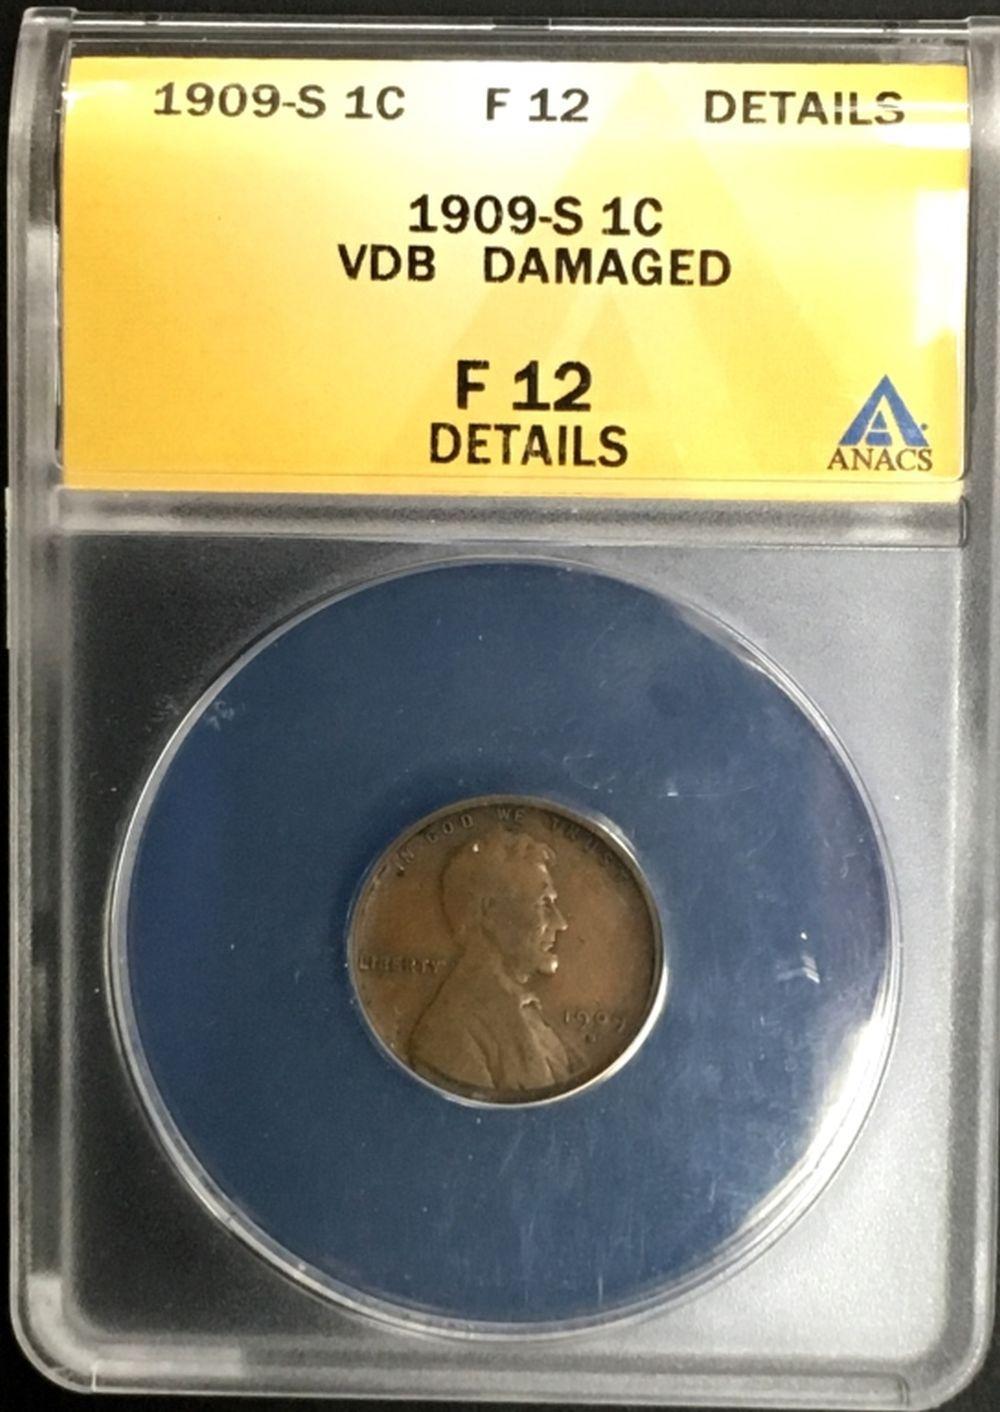 Lot 141: 1909-S VDB F-12 DETAILS DAMAGED - ANACS